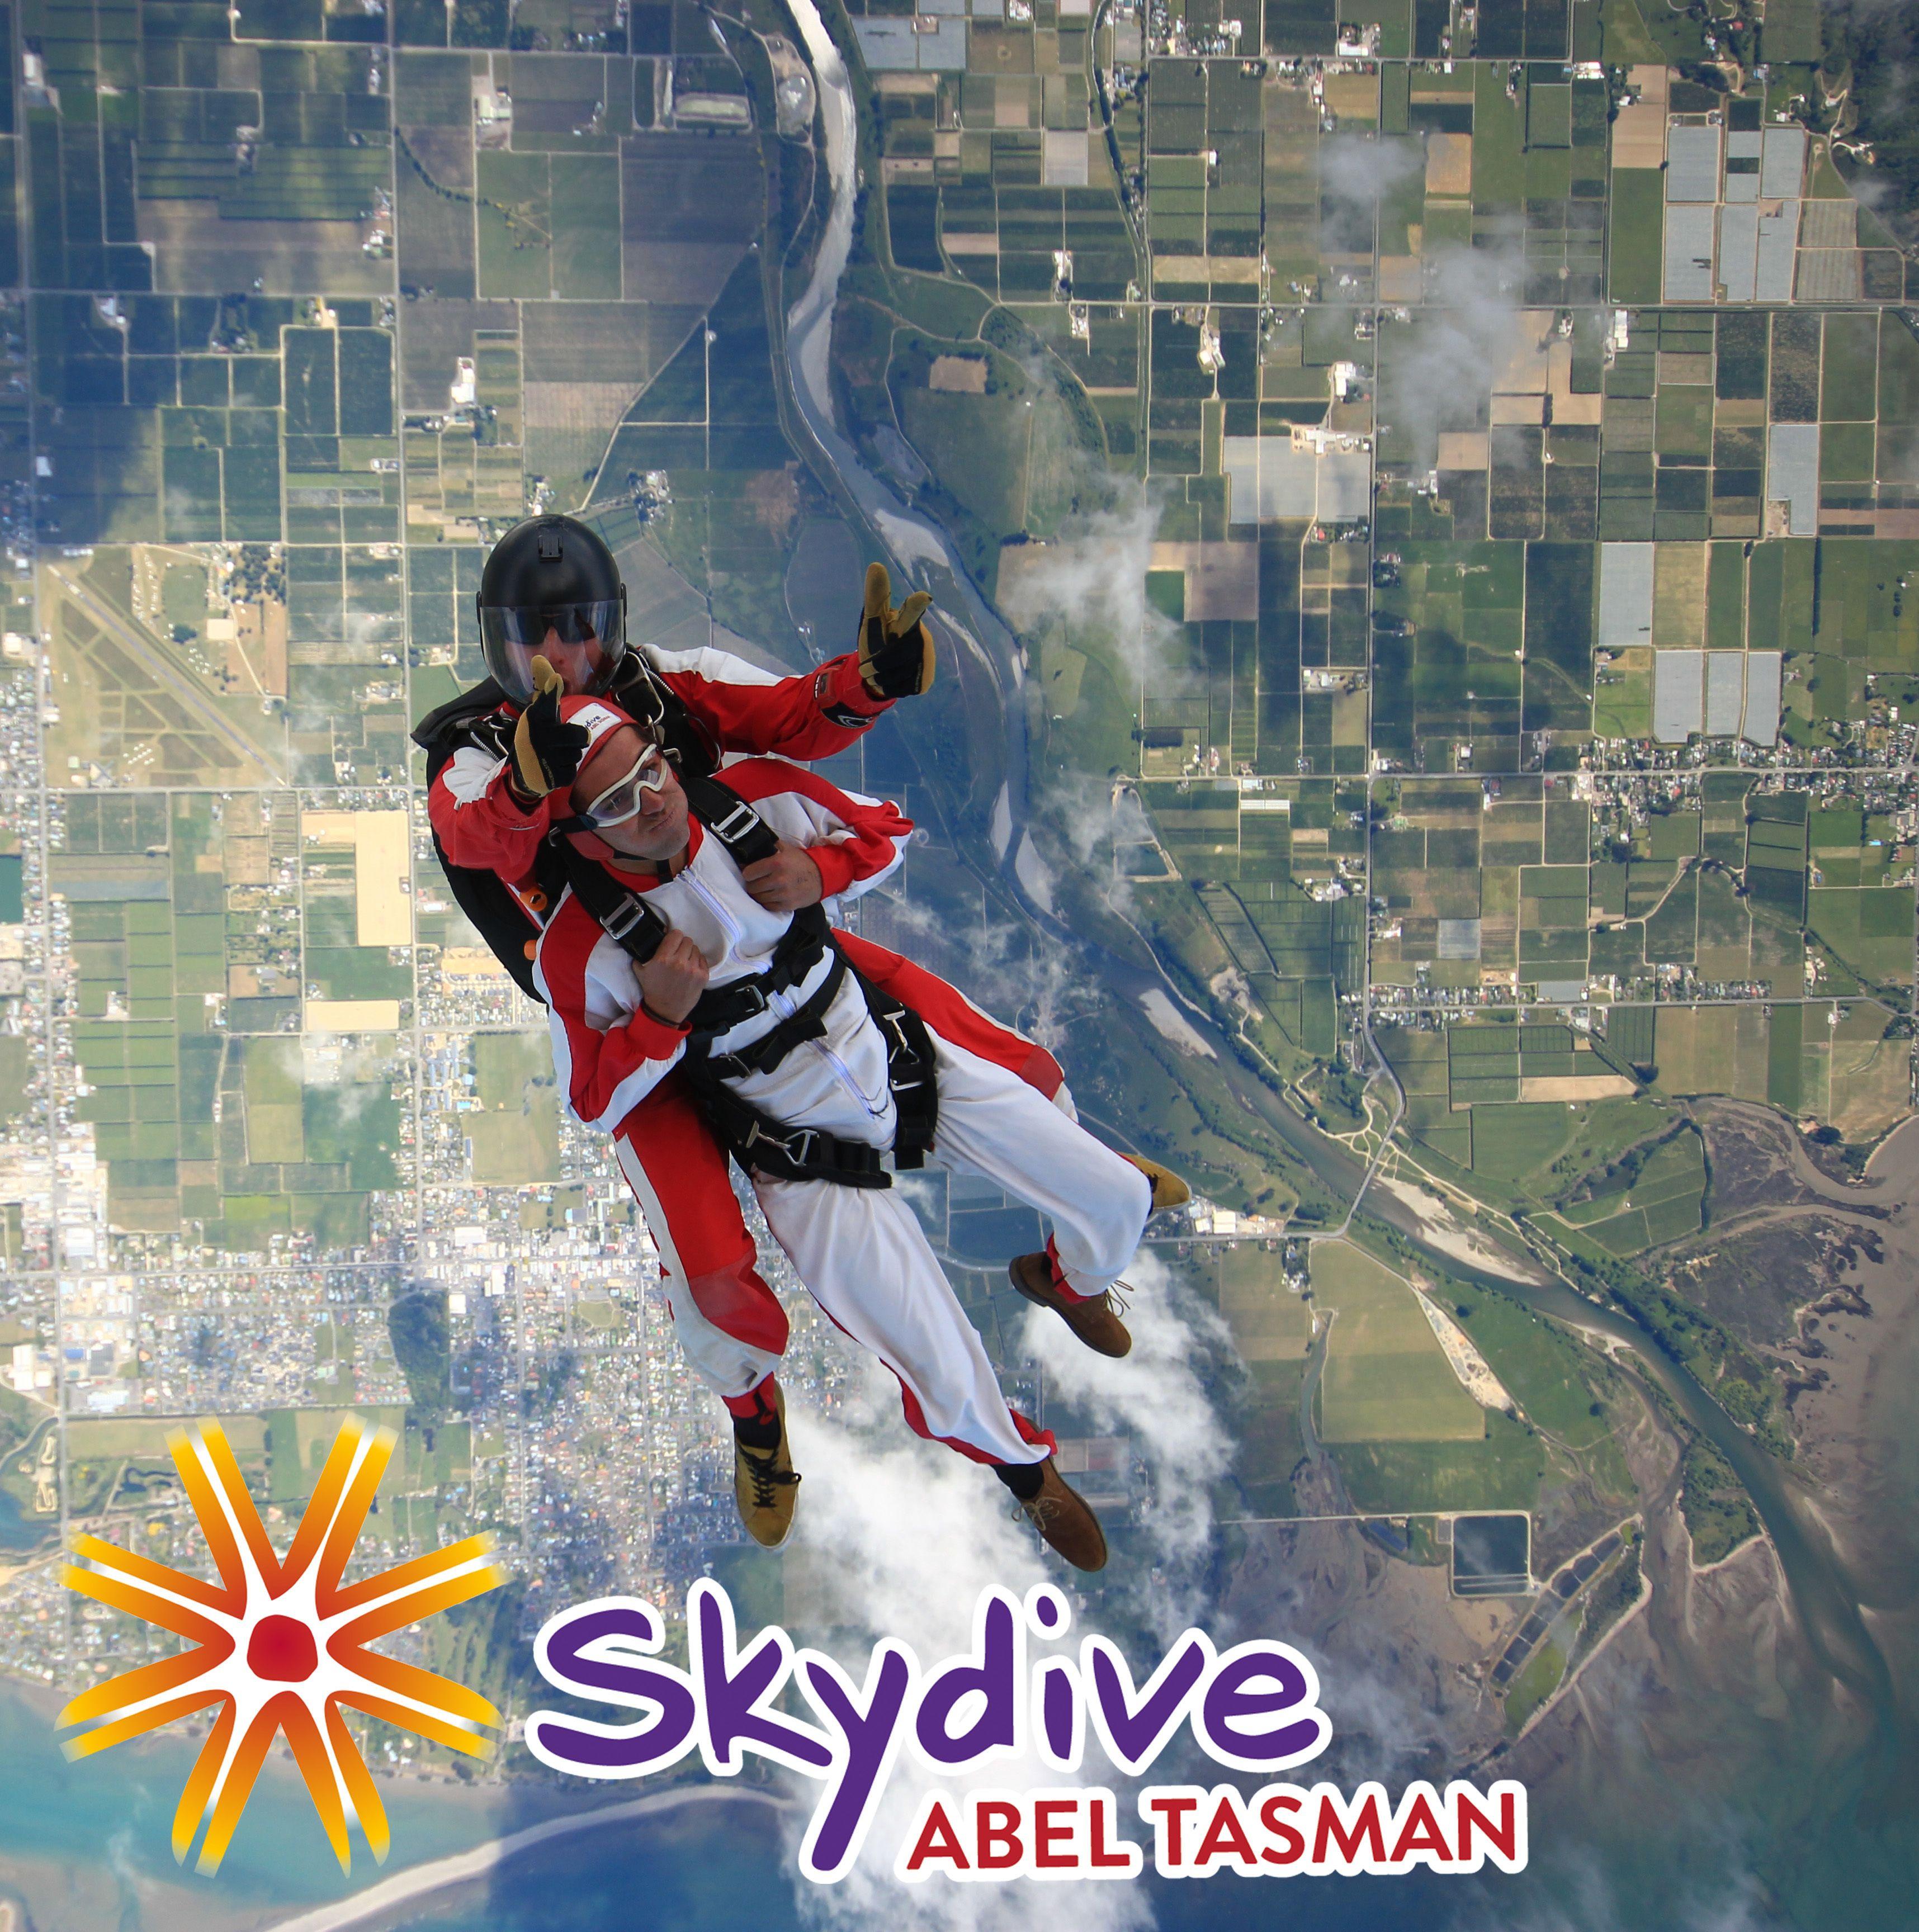 Skydive Abel Tasman Tandem Skydive